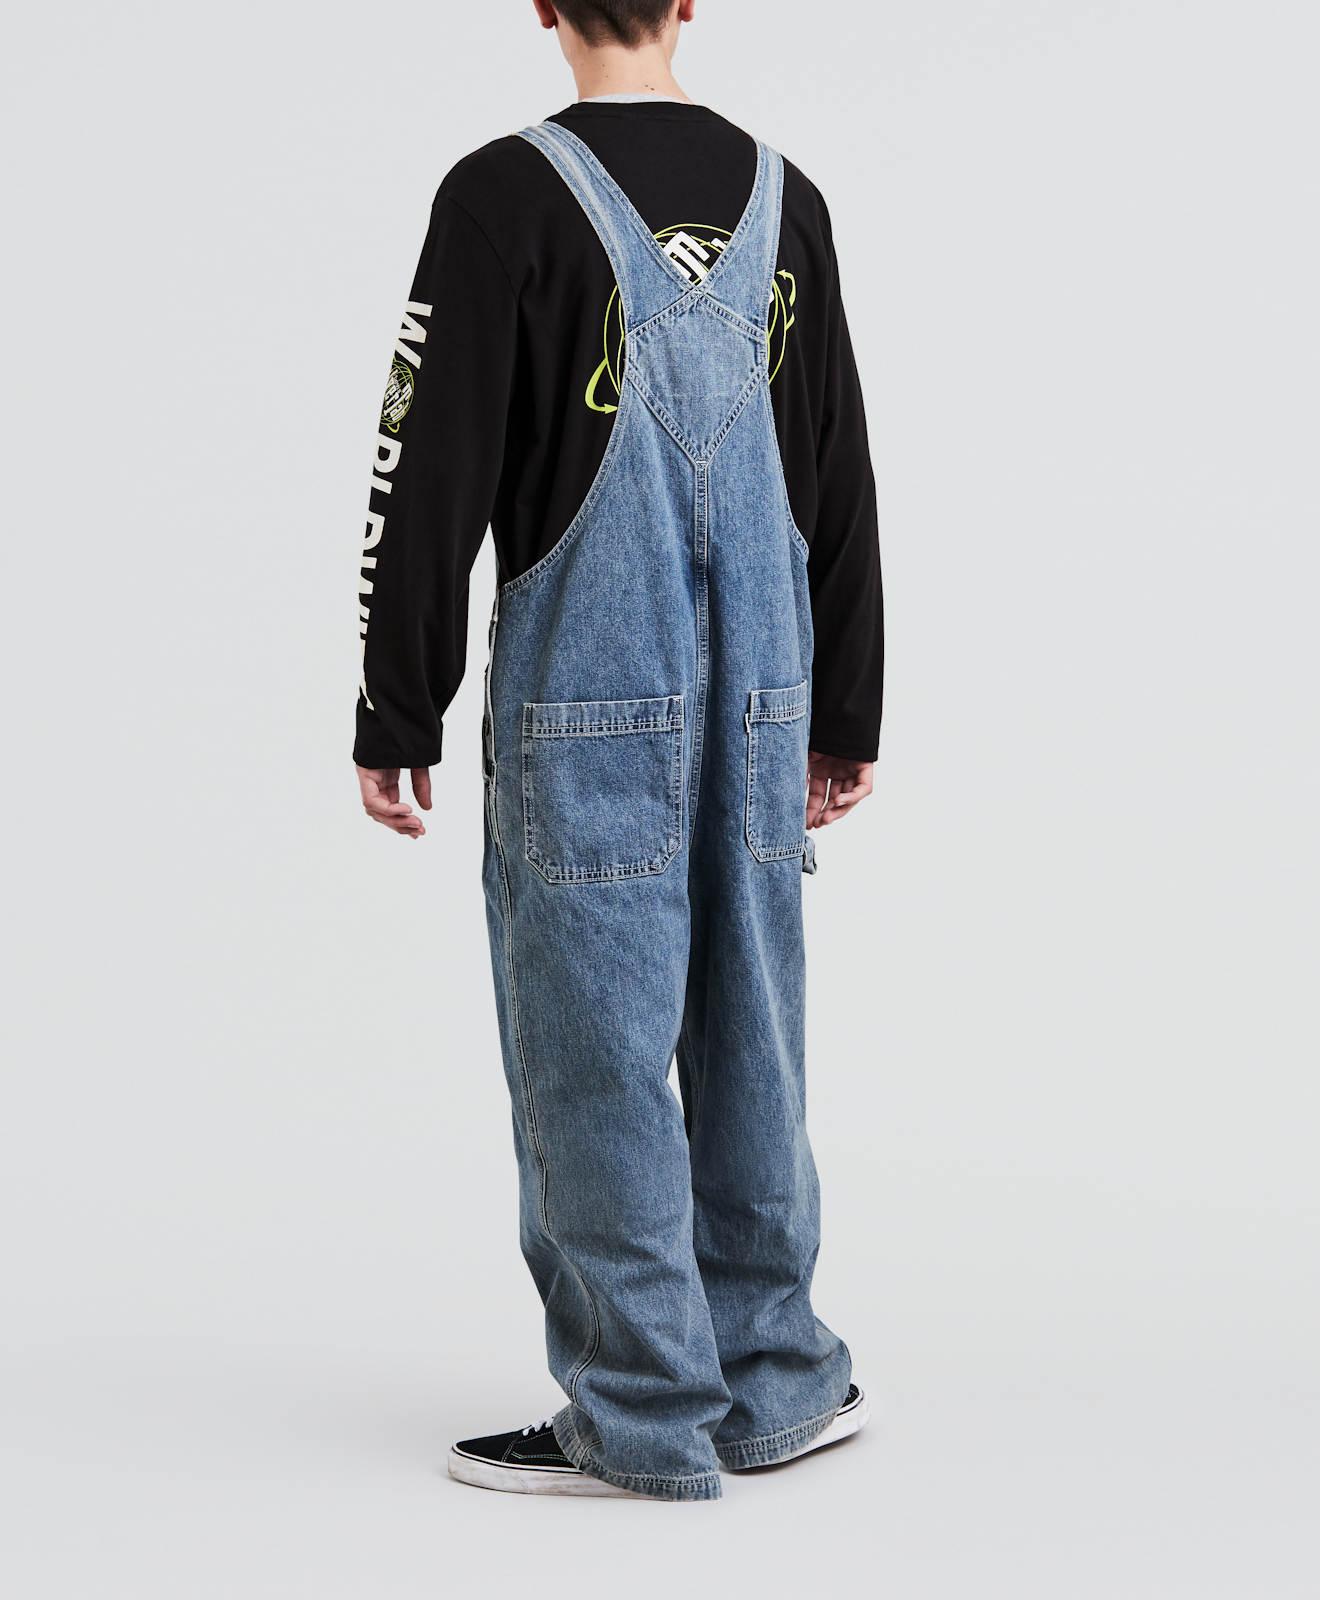 Levis Silvertab Air Jeans Qumvszp Overall Hose Bel Herren Anzug Denim ® ukZXiOP